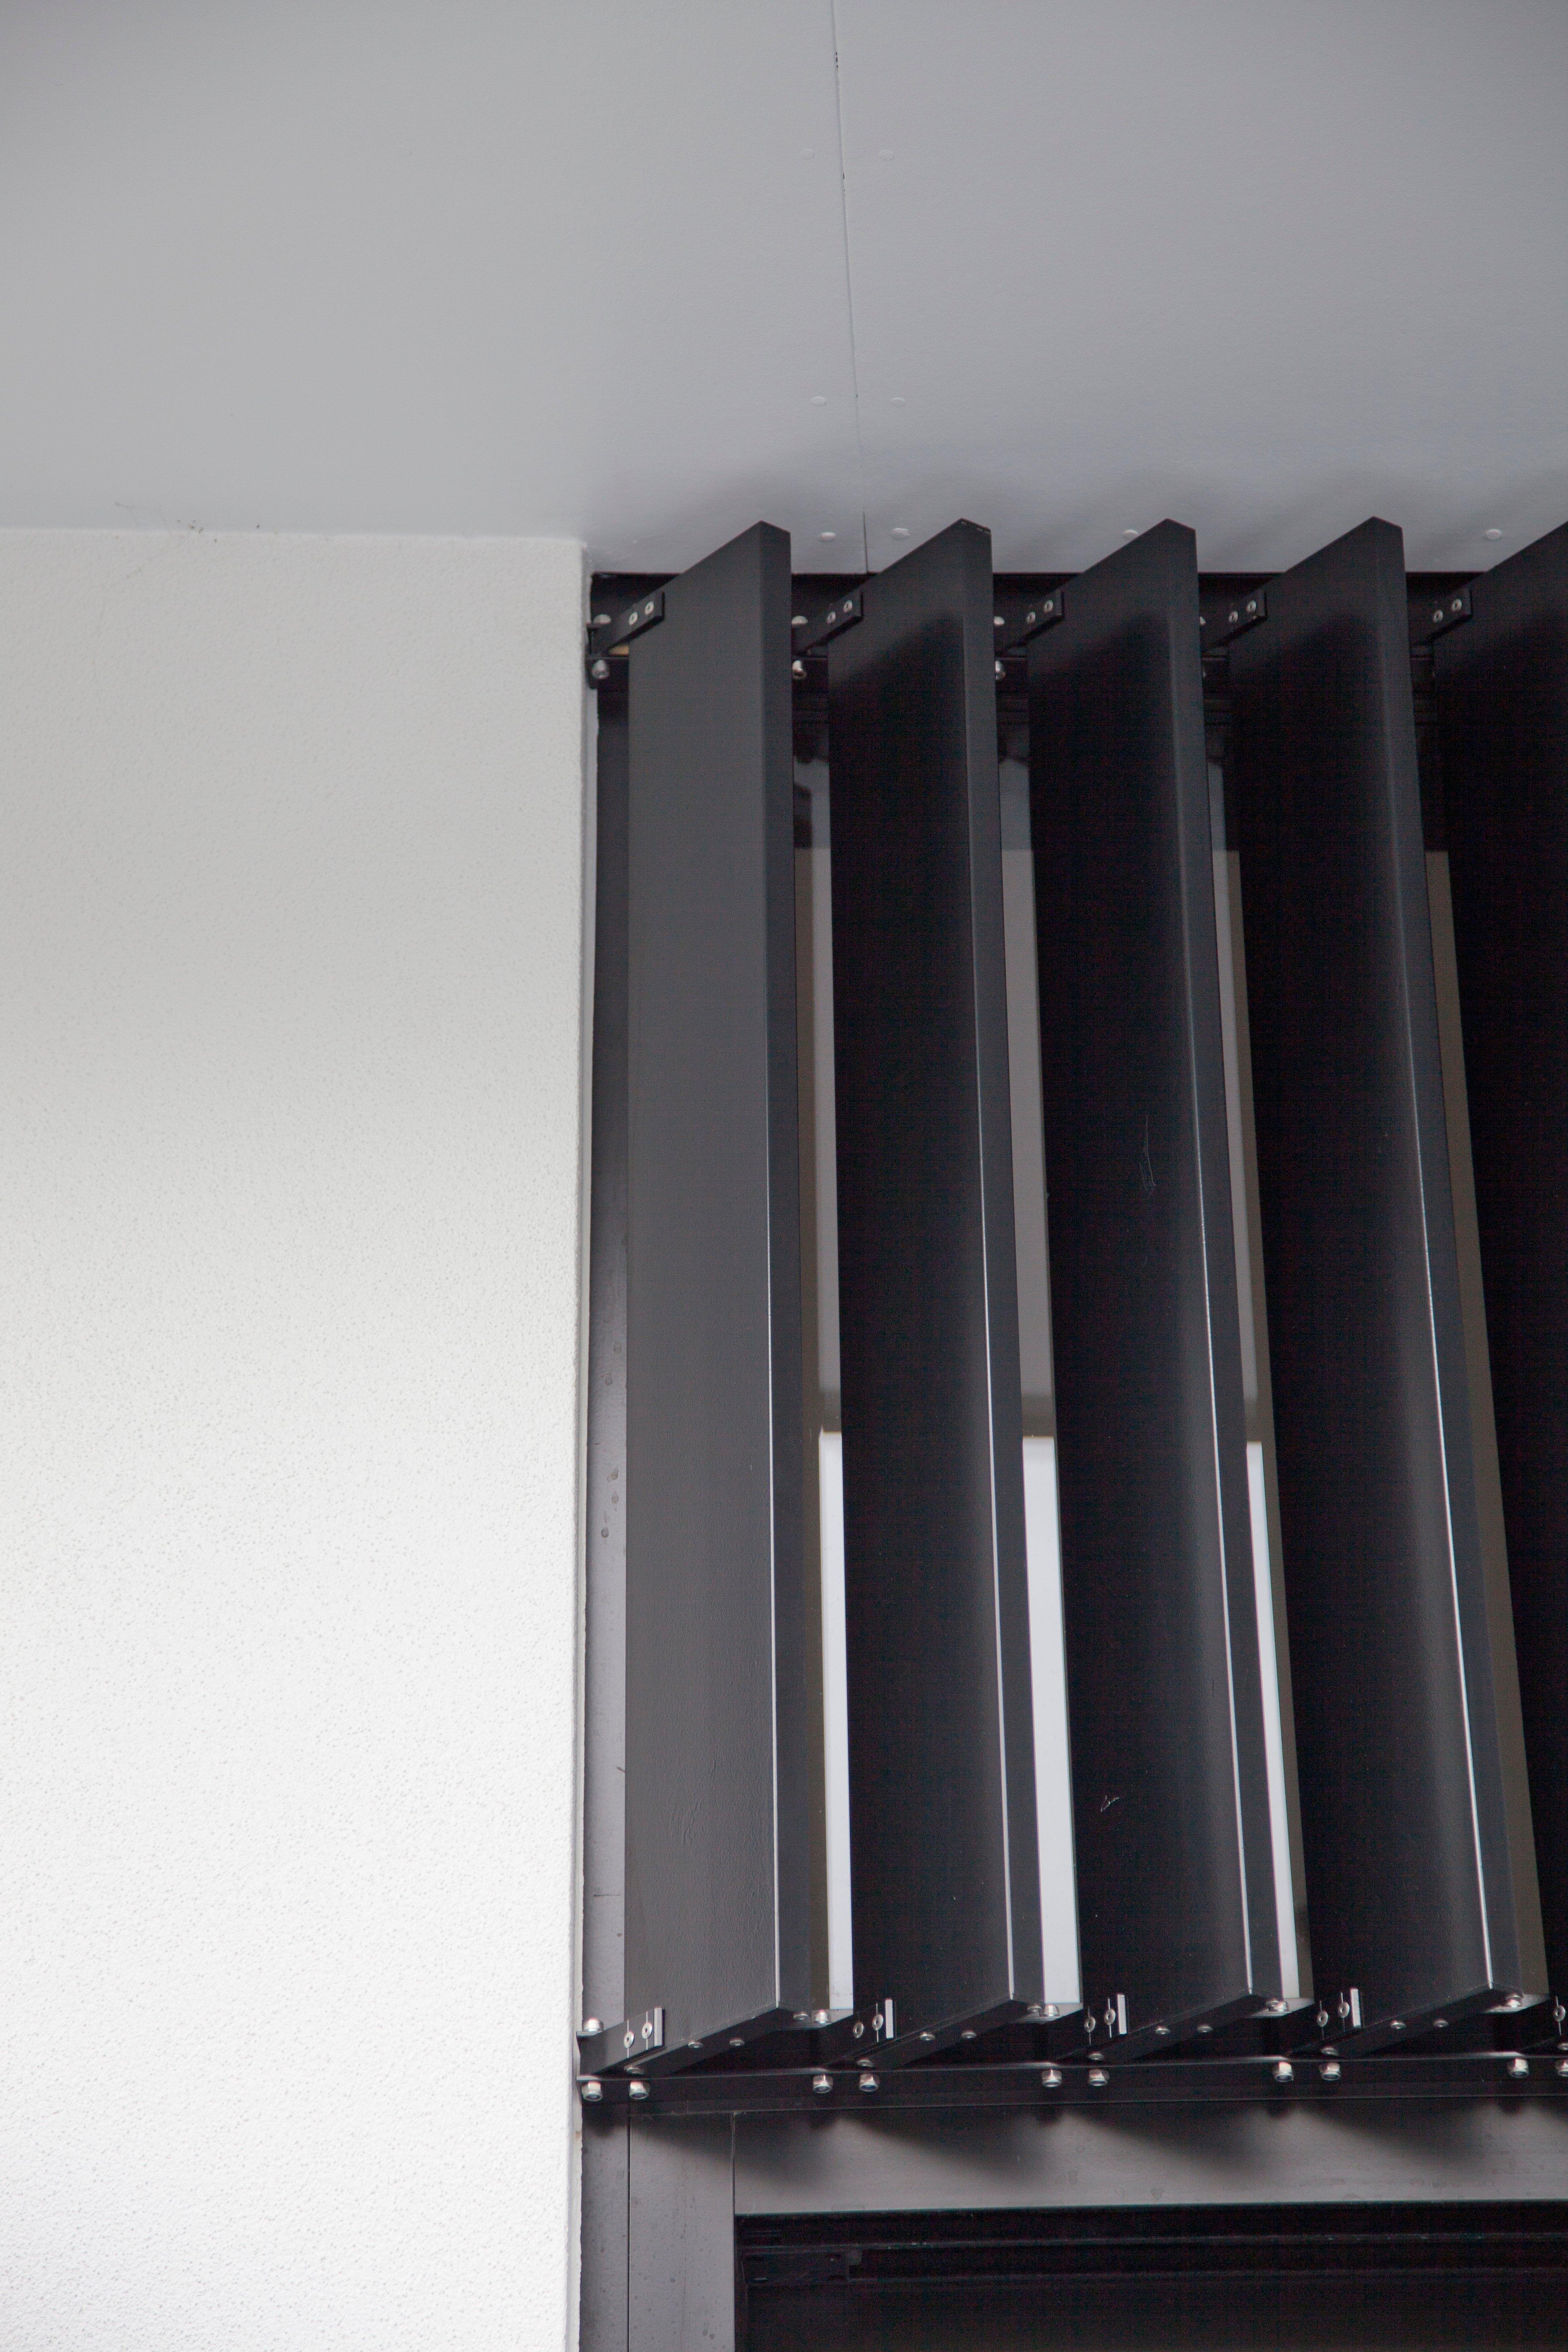 Black powder-coated louvre blades